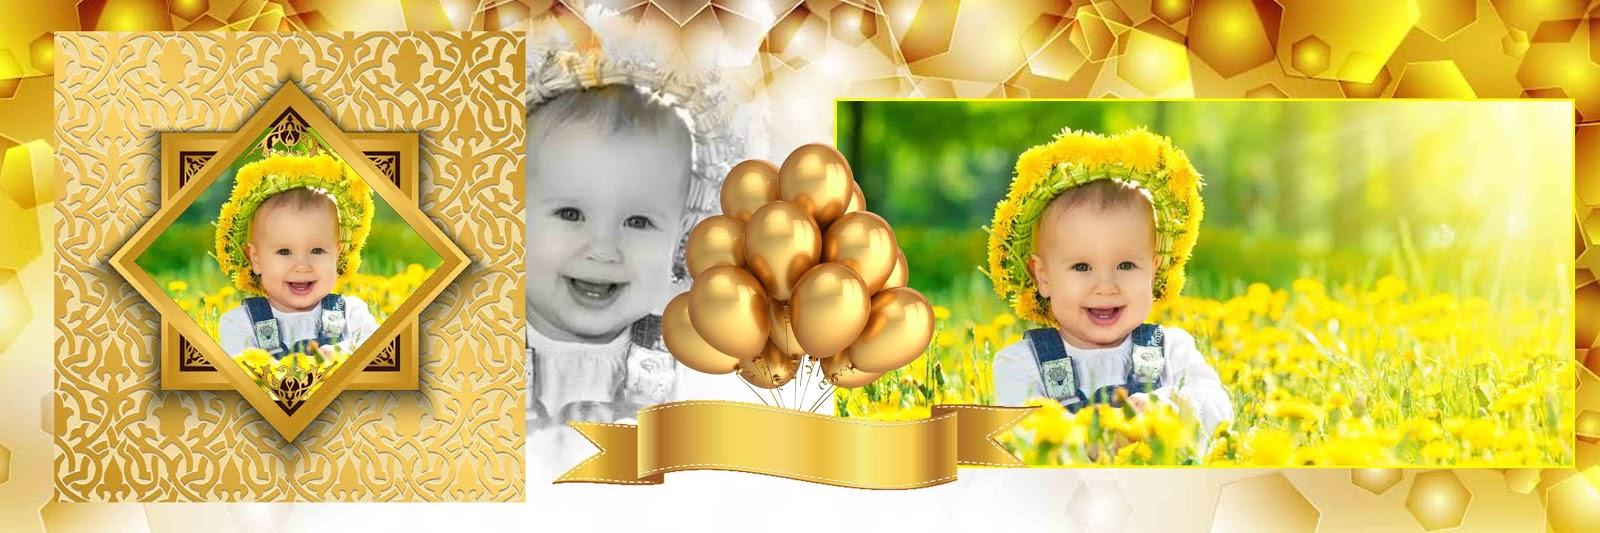 Dx Album Birthday Golden Backgrounds Album 12x36 Psd